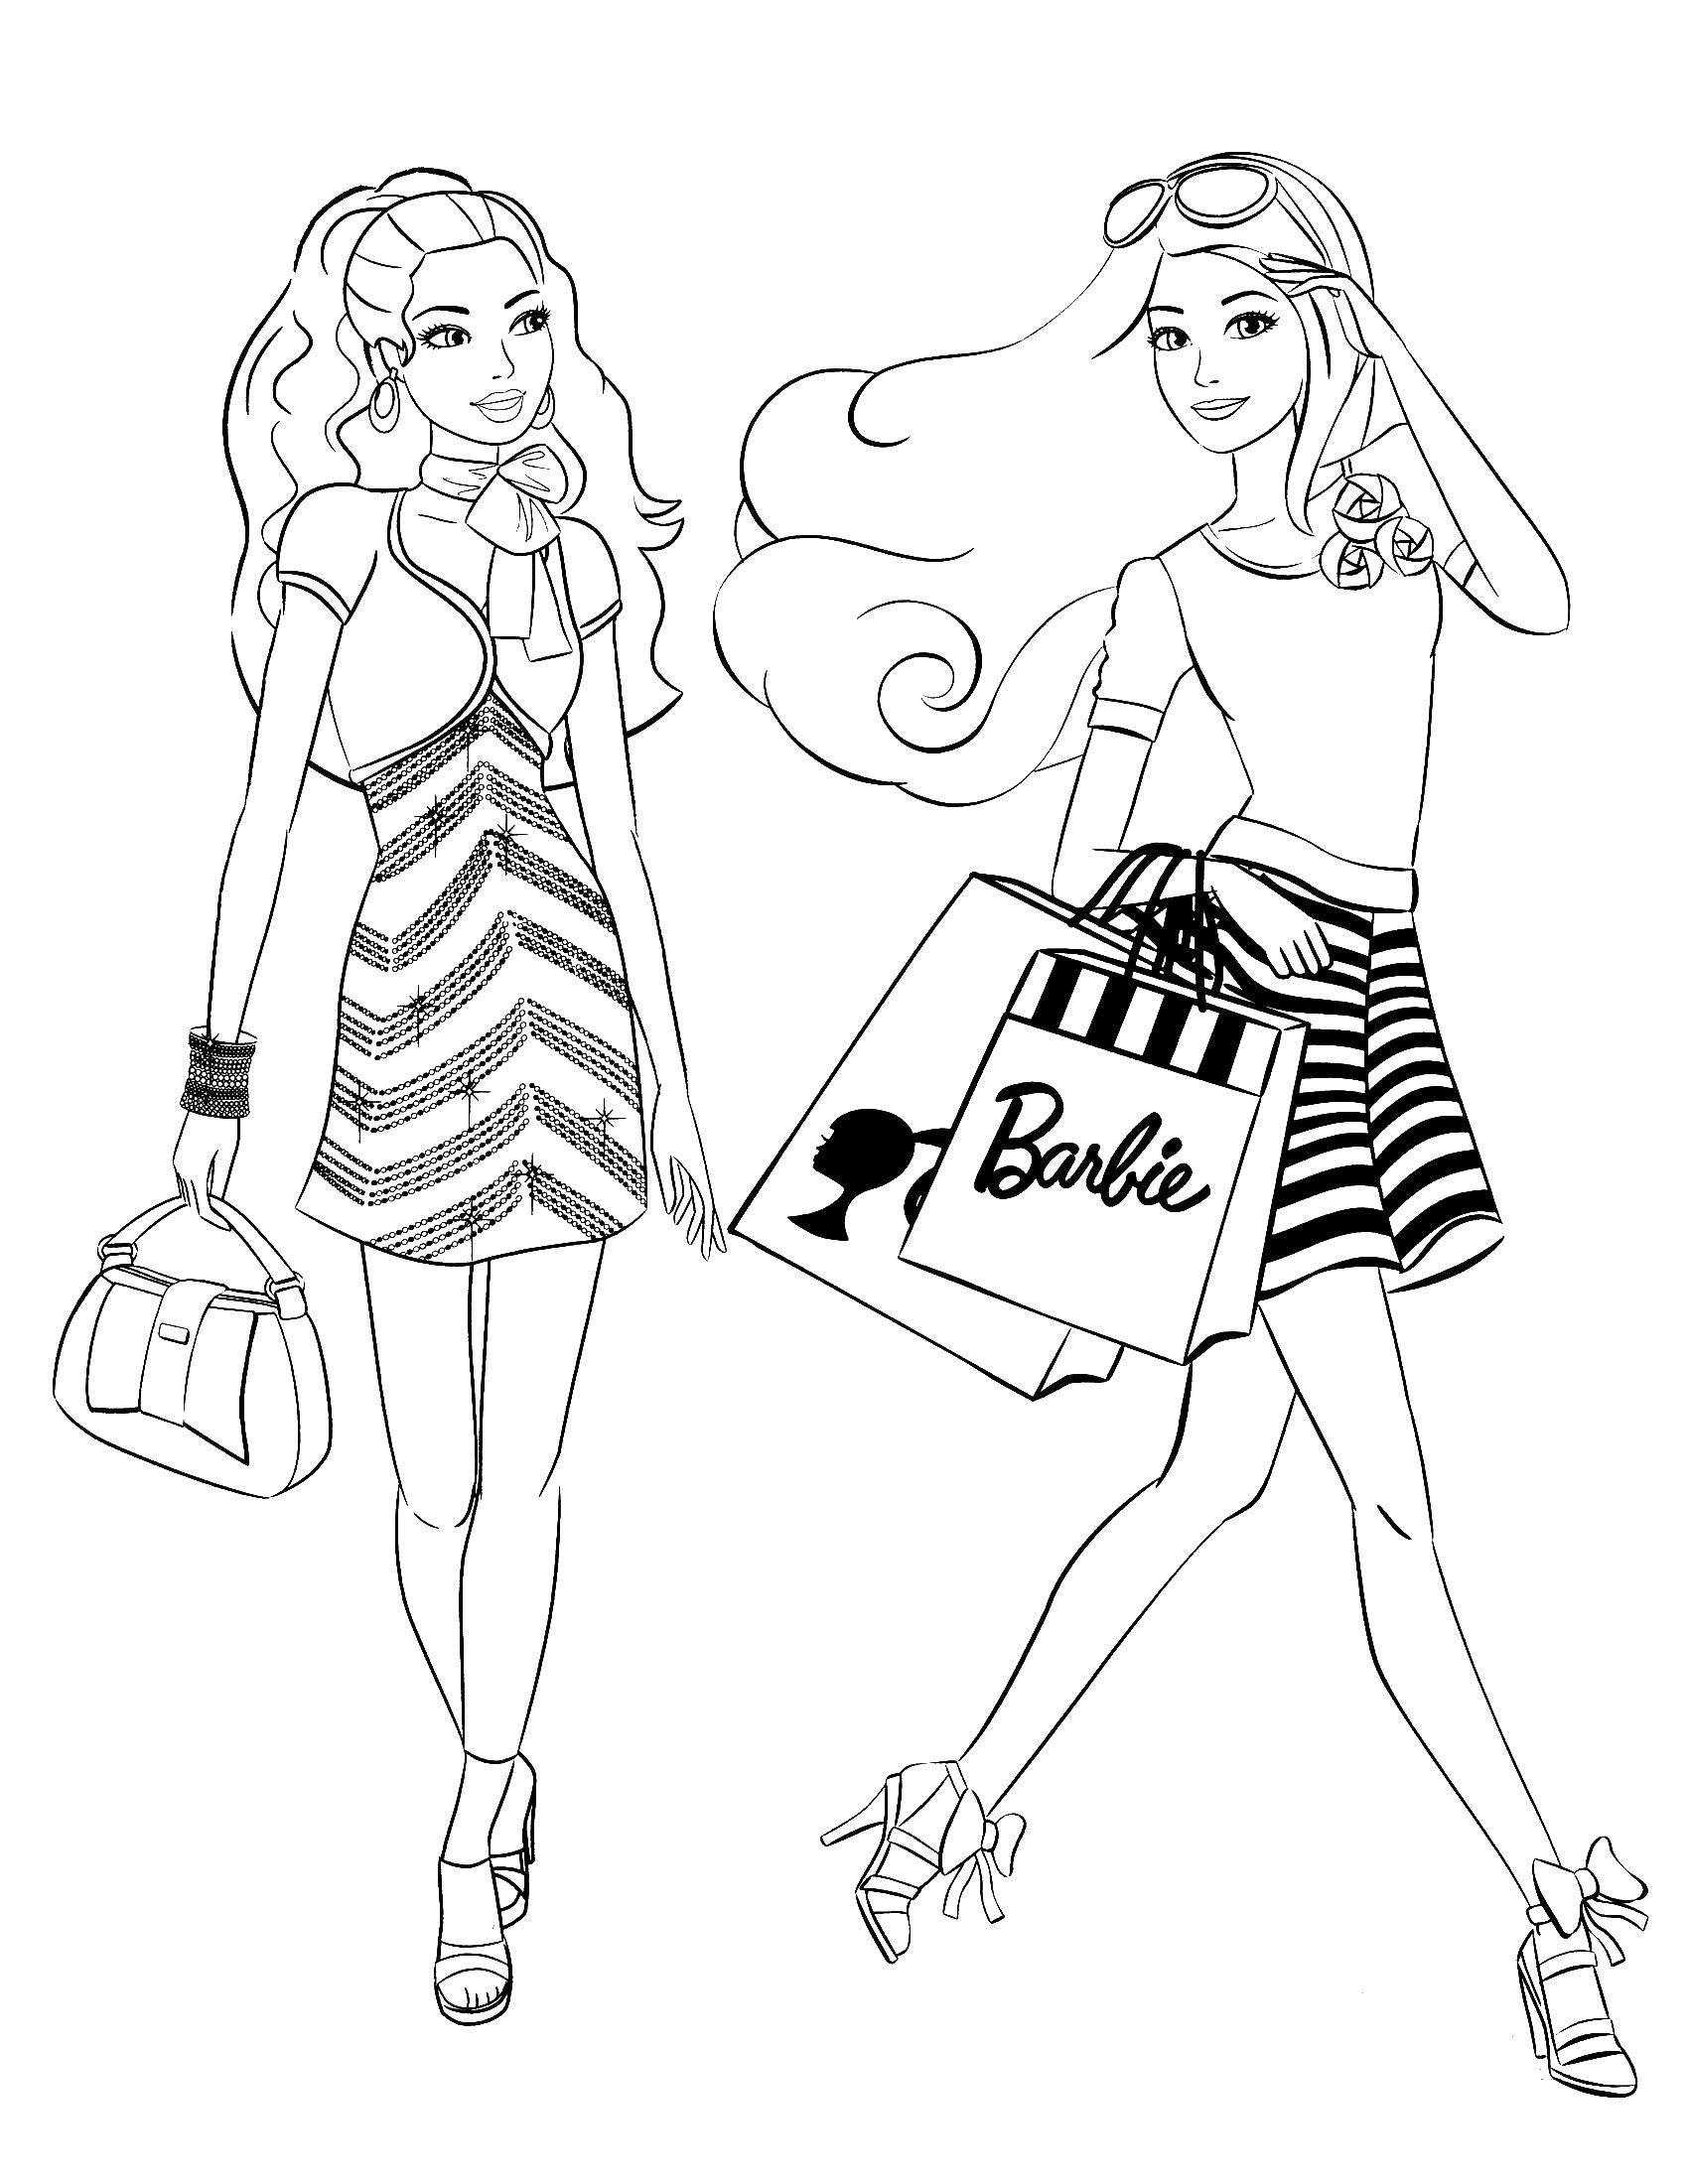 Раскраска Барби Скачать майнкрафт, молот.  Распечатать ,майнкрафт,